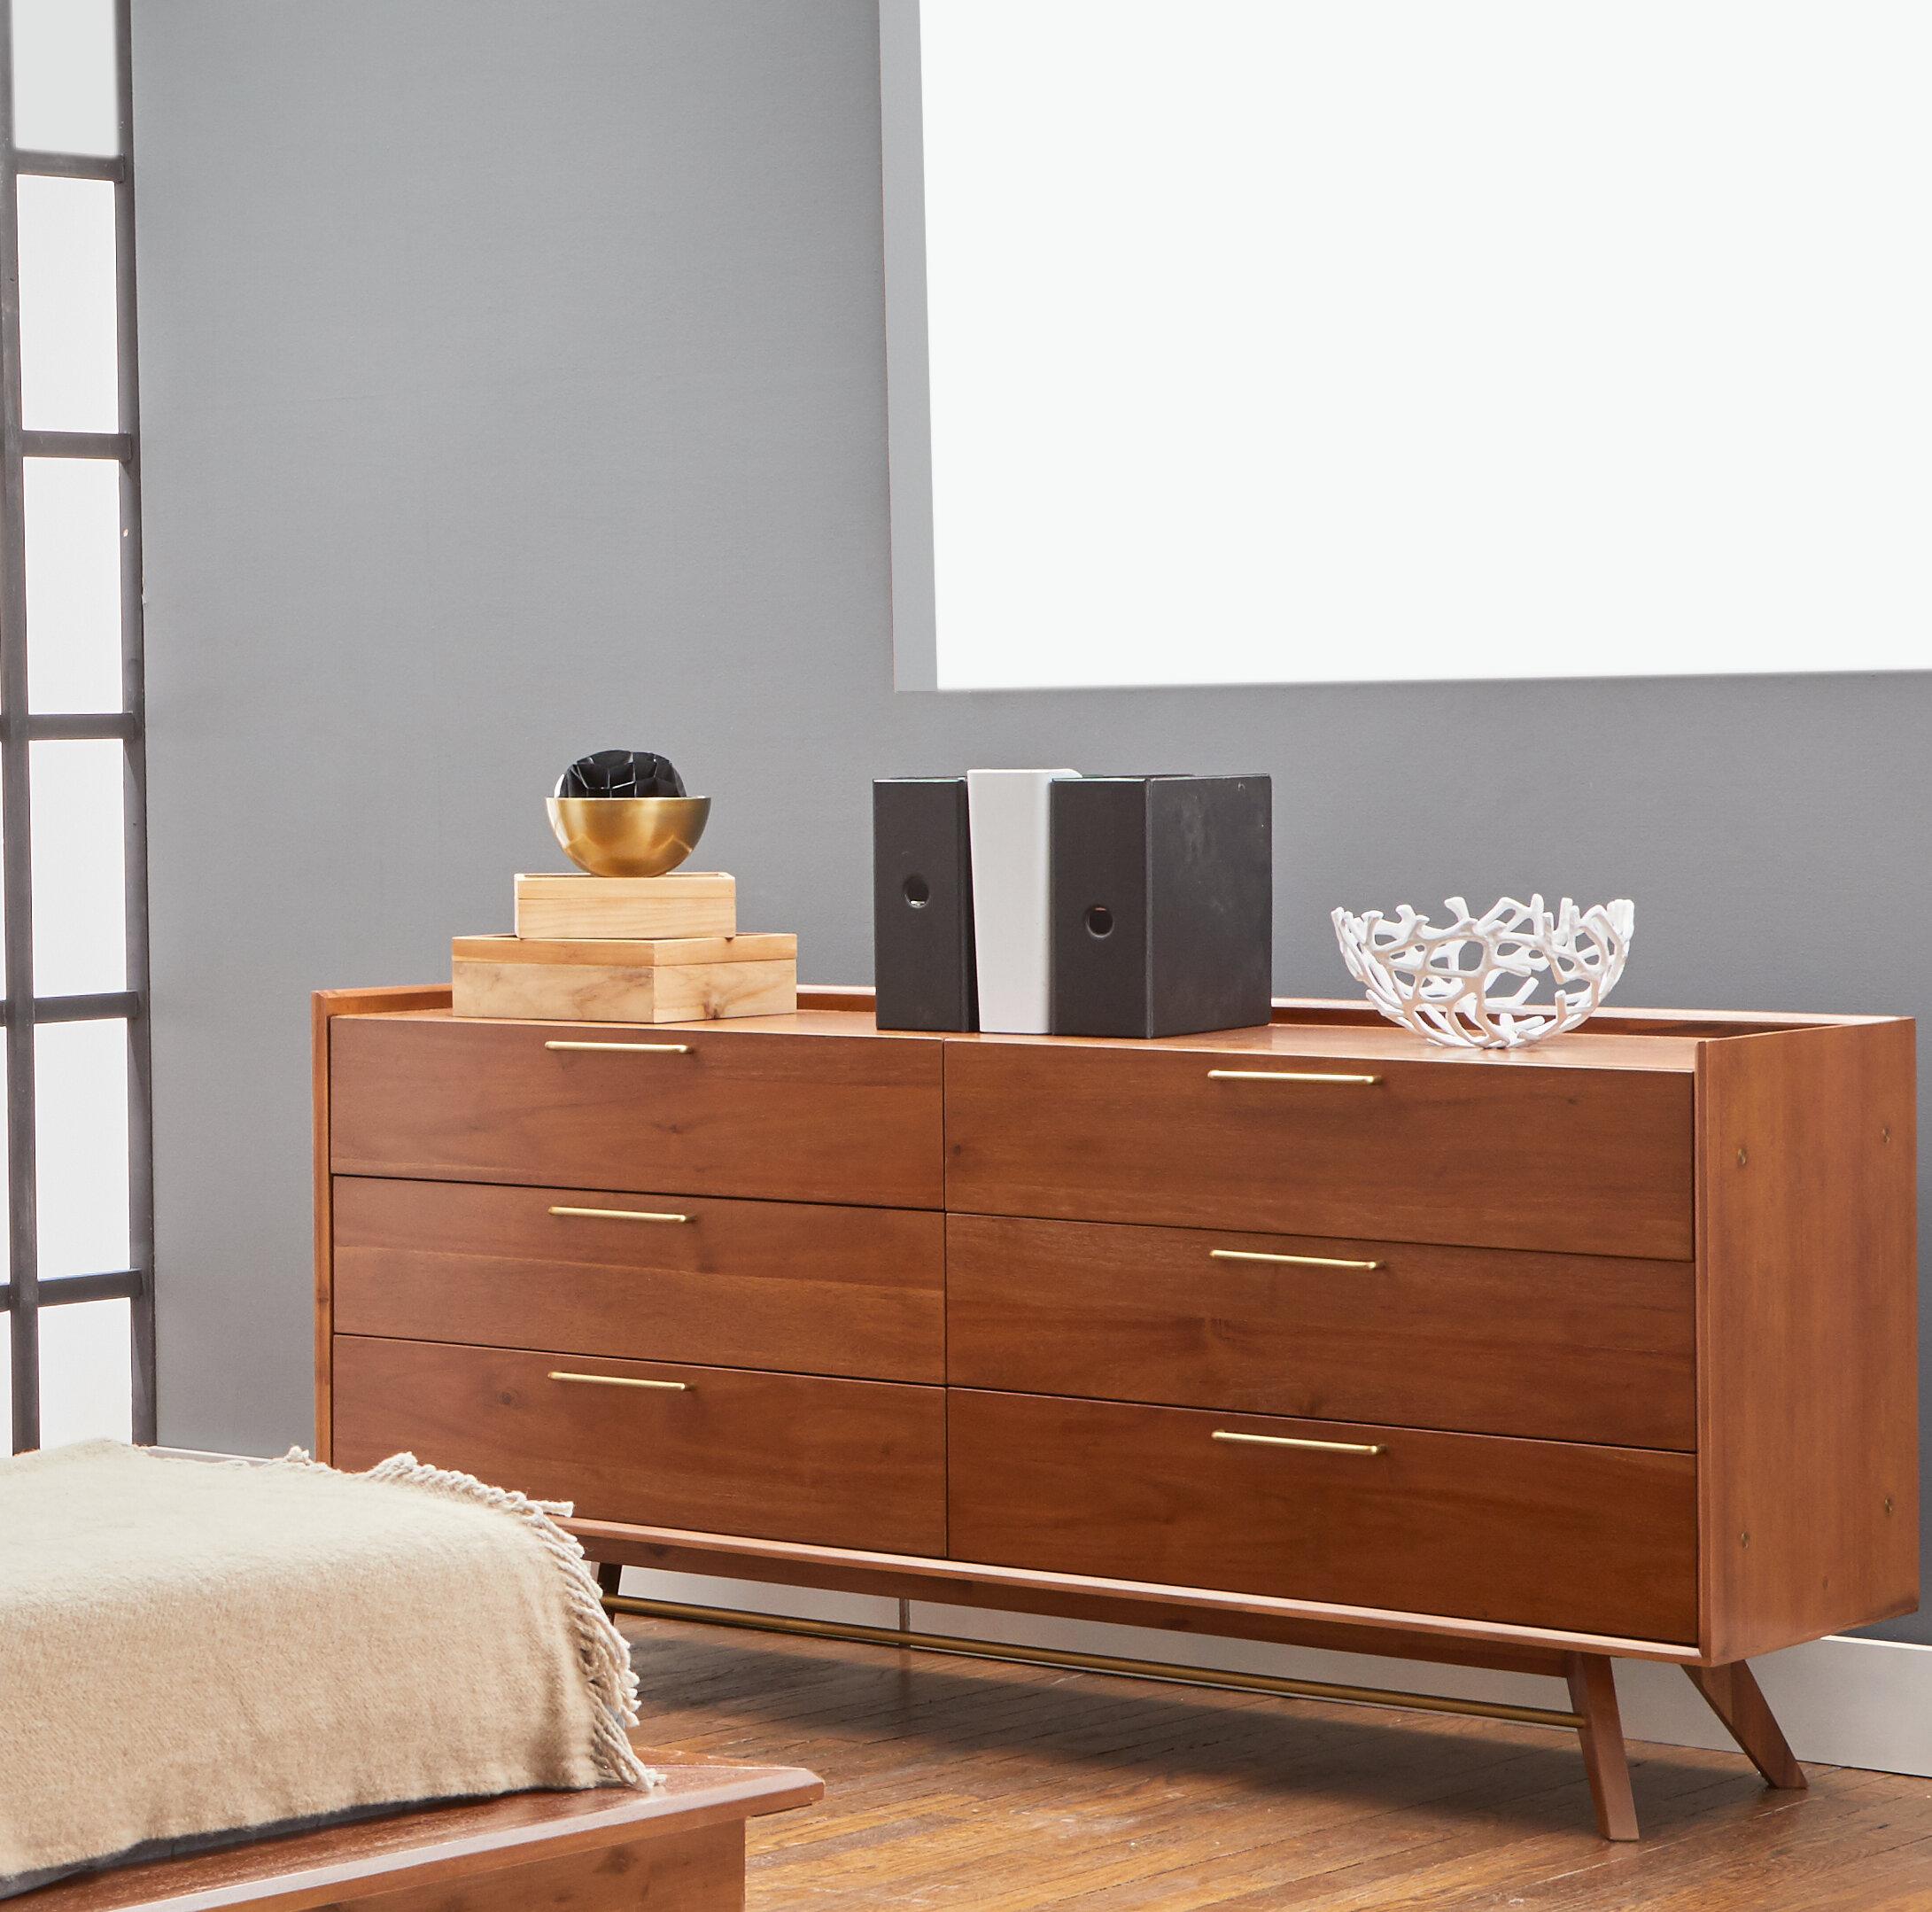 Moffitt 6 drawer double dresser with mirror